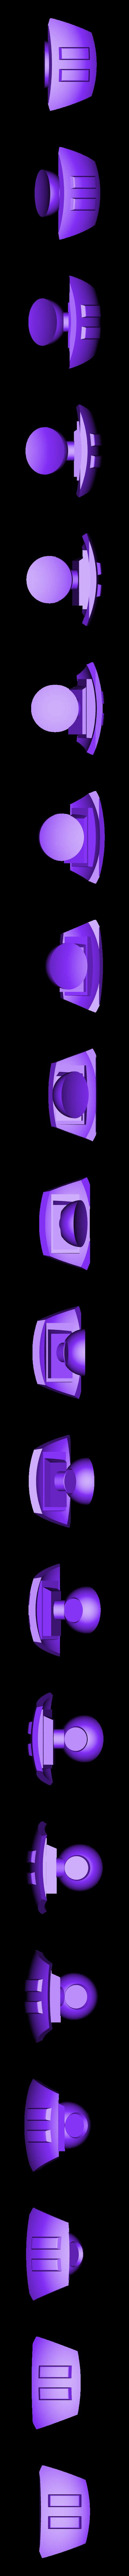 Should-Left.stl Download STL file Hammond's Wrecking Ball Mech from Overwatch • 3D printer template, FunbieStudios